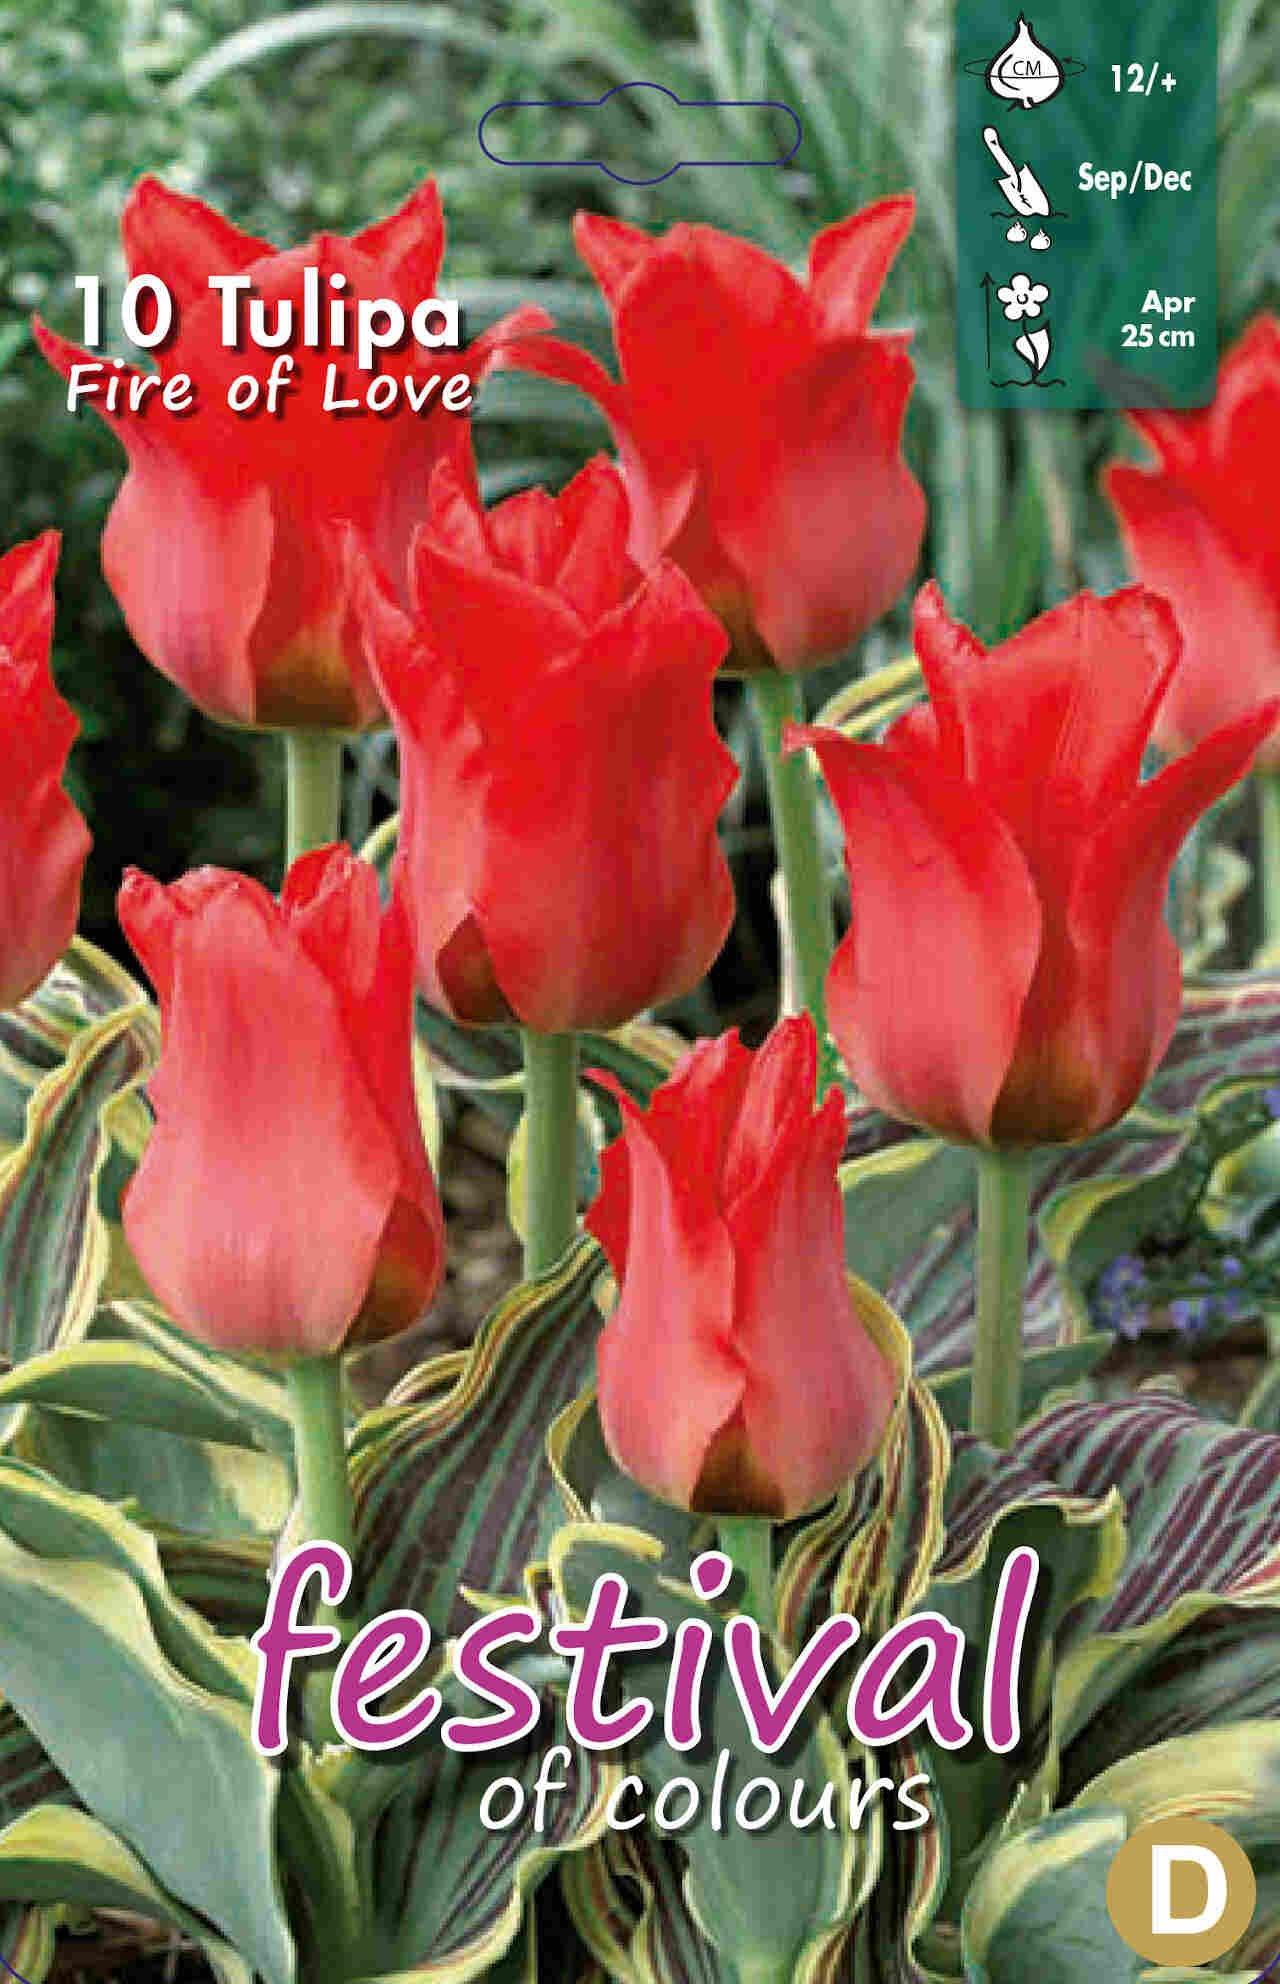 Tulipanløg - Tulipa Fire of Love 12/+